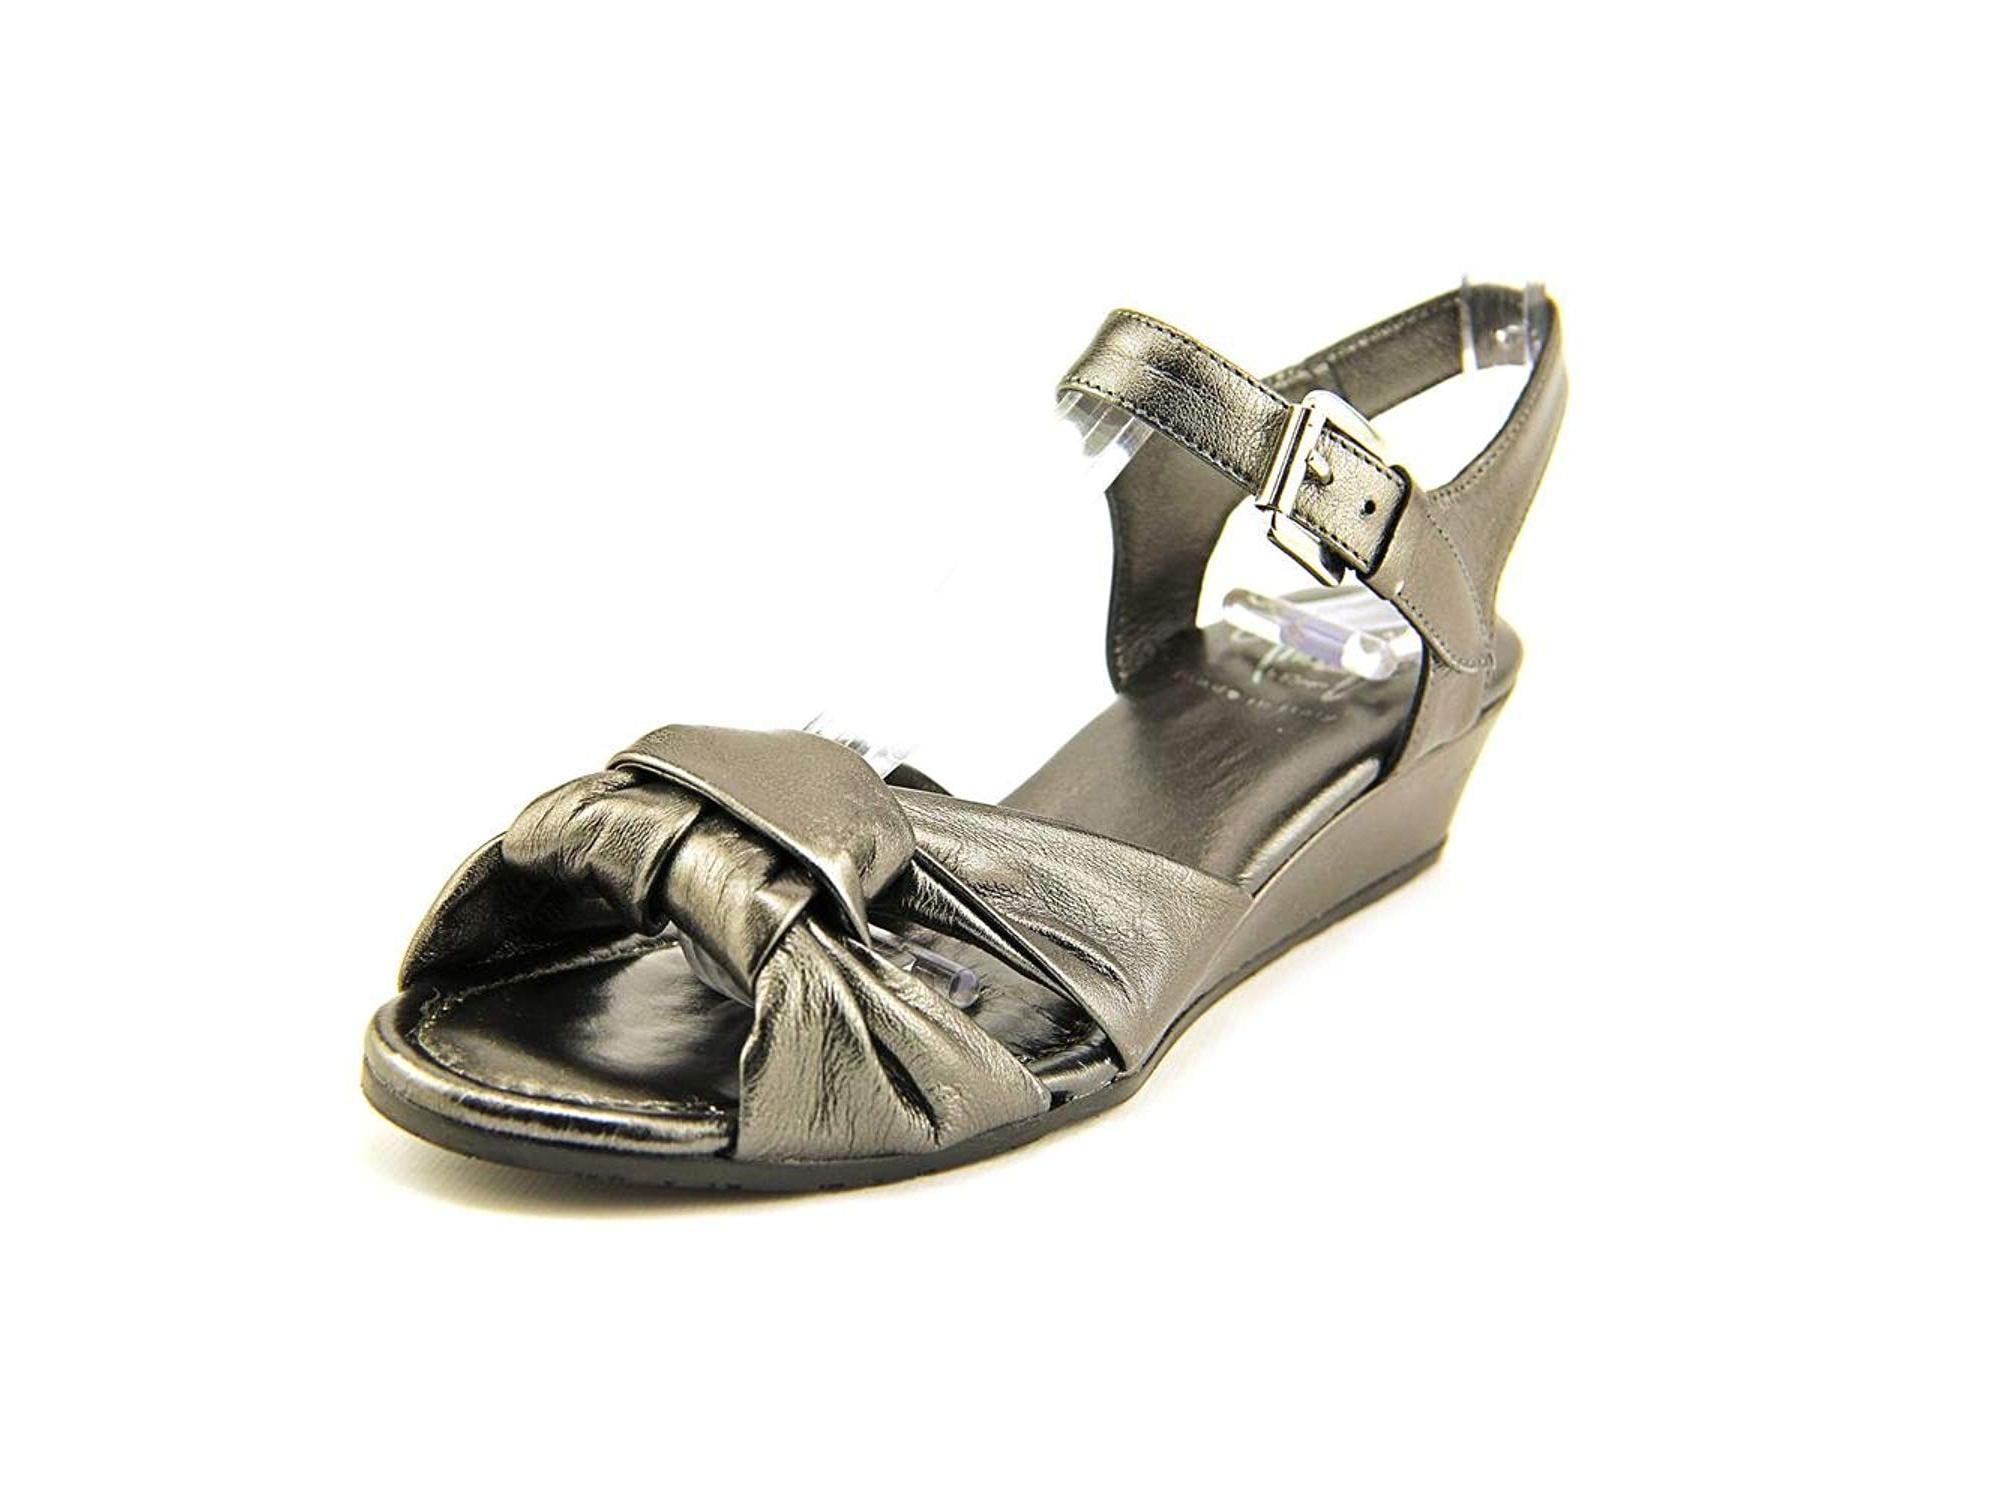 Amalfi By Rangoni Womens Mandy Open Toe Casual Ankle Strap Sandals by Amalfi by Rangoni